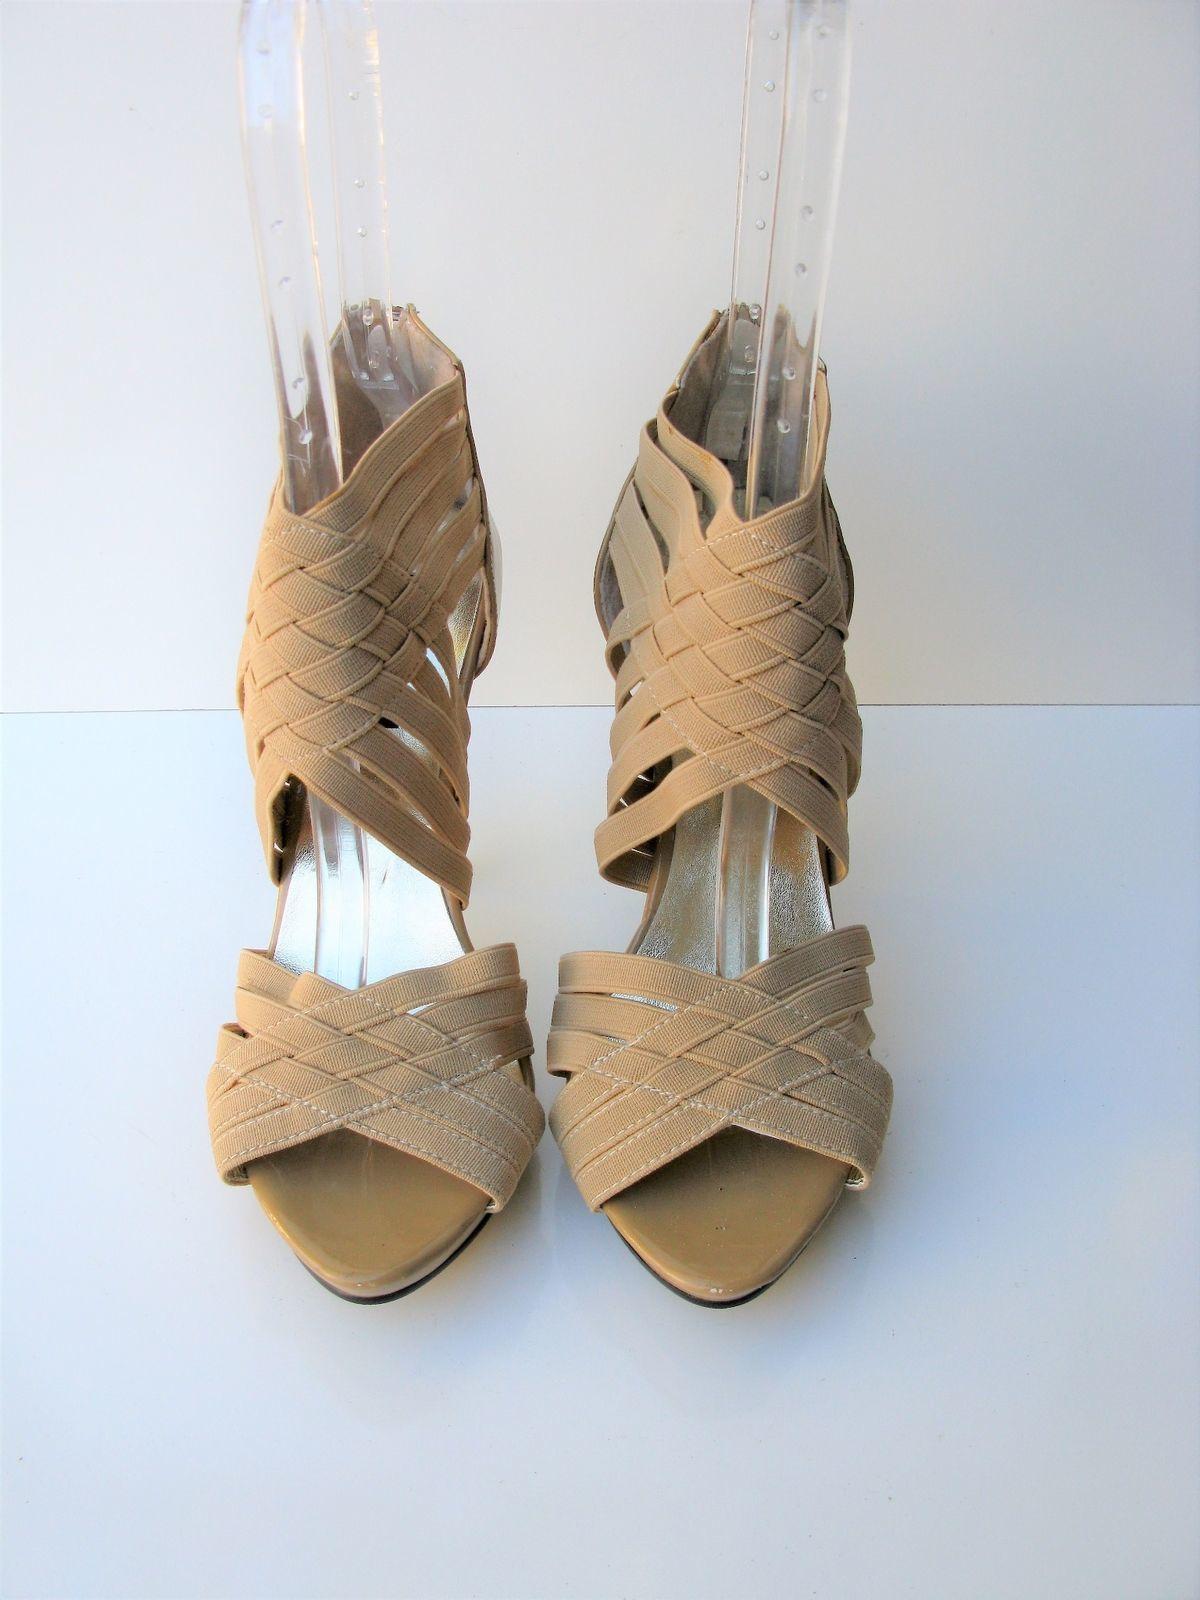 Roberto Heeled Sandals Strappy Caged Bandage Platform Stiletto Heels 38 NWOB